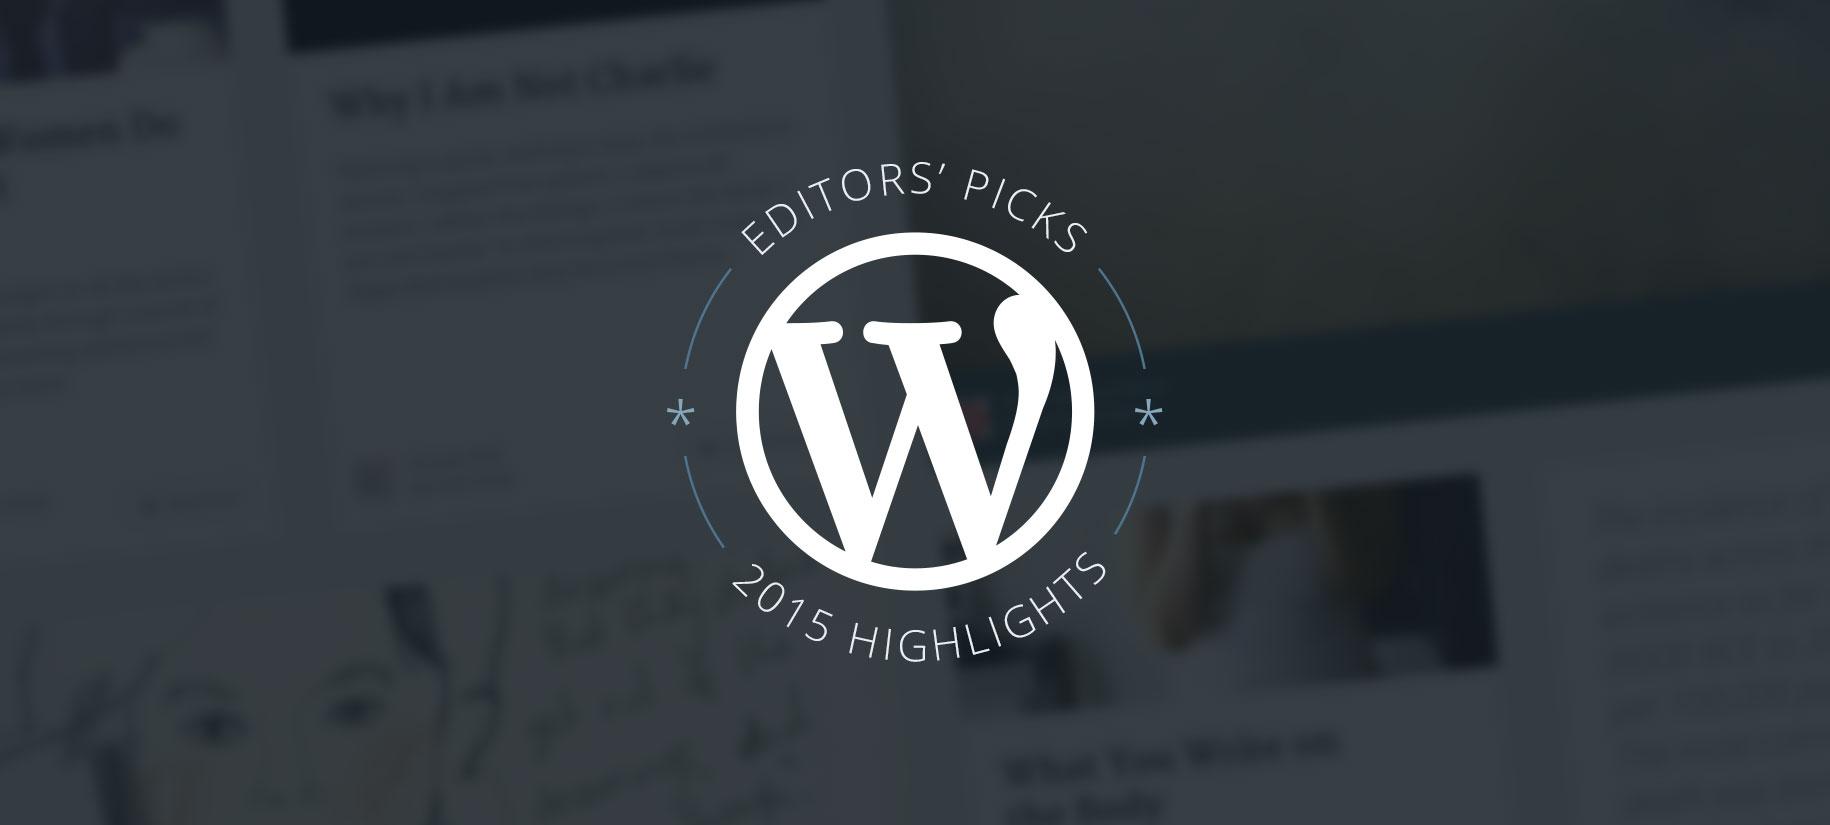 EditorsPicks-2015